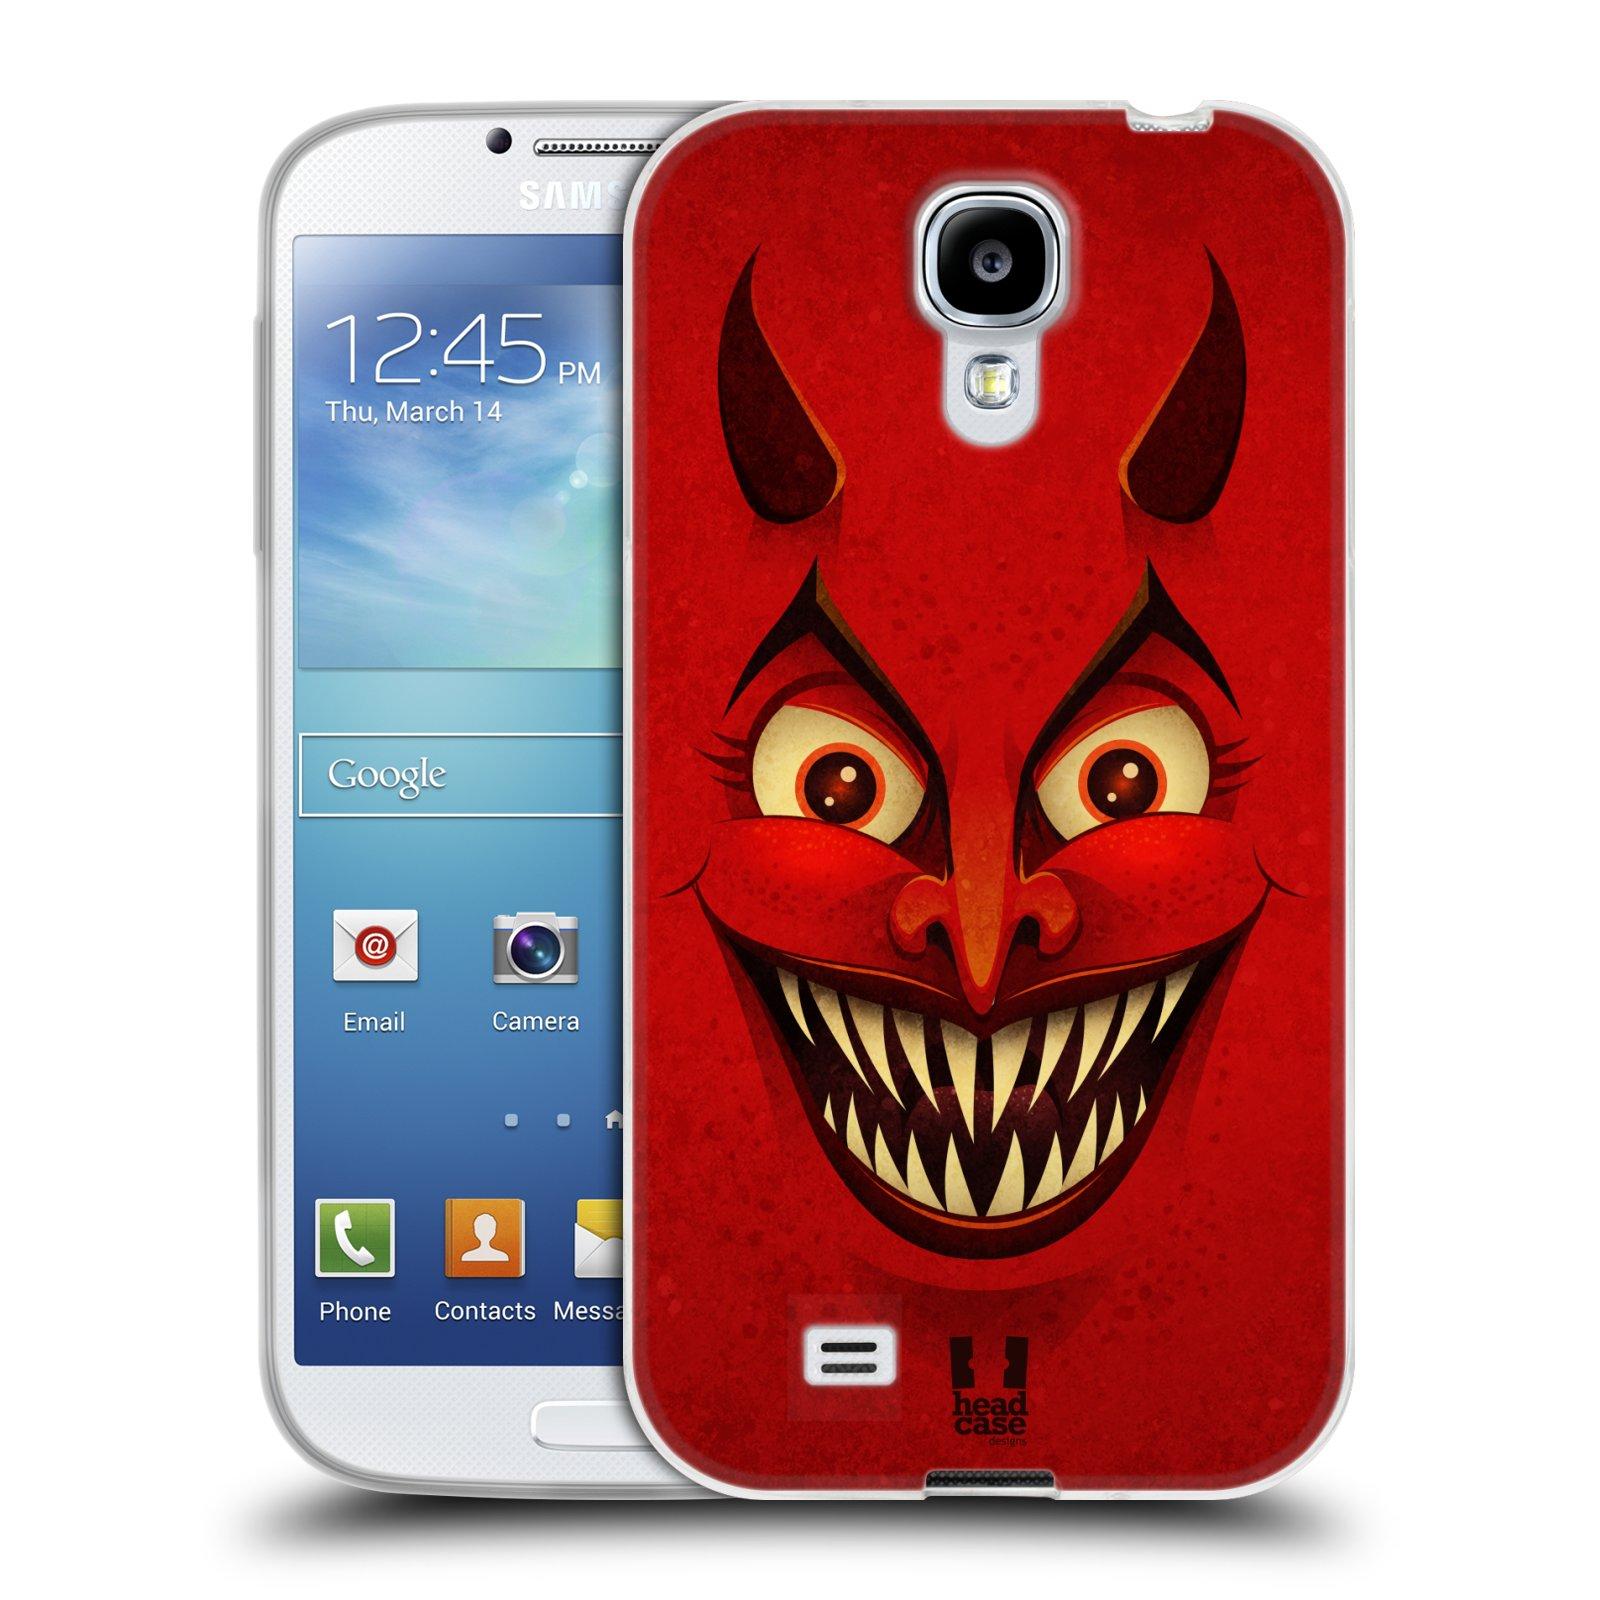 Silikonové pouzdro na mobil Samsung Galaxy S4 HEAD CASE ČERT (Silikonový kryt či obal na mobilní telefon Samsung Galaxy S4 GT-i9505 / i9500)